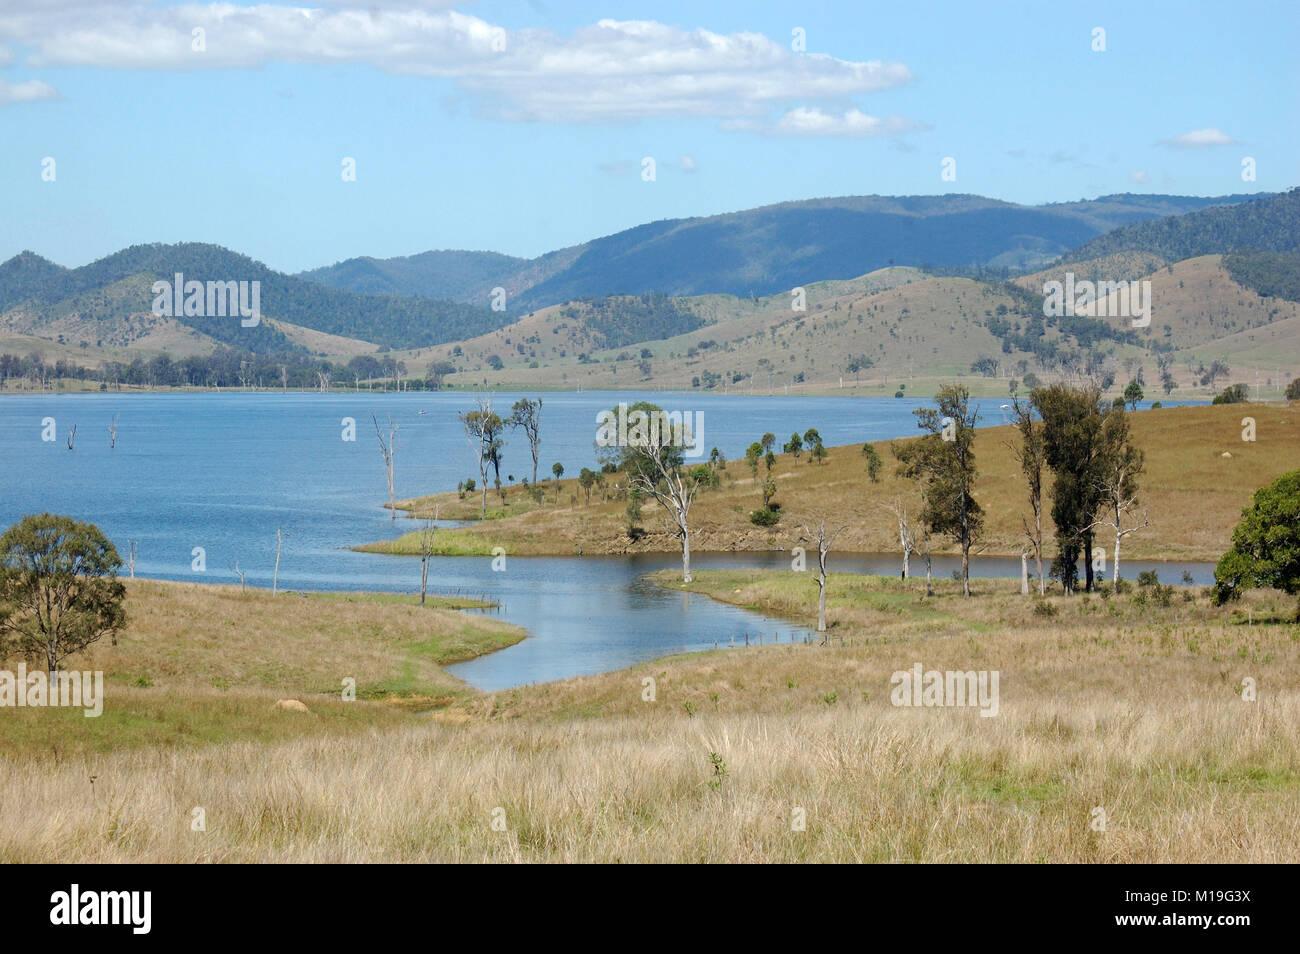 Somerset Dam during drought, Queensland, Australia - Stock Image